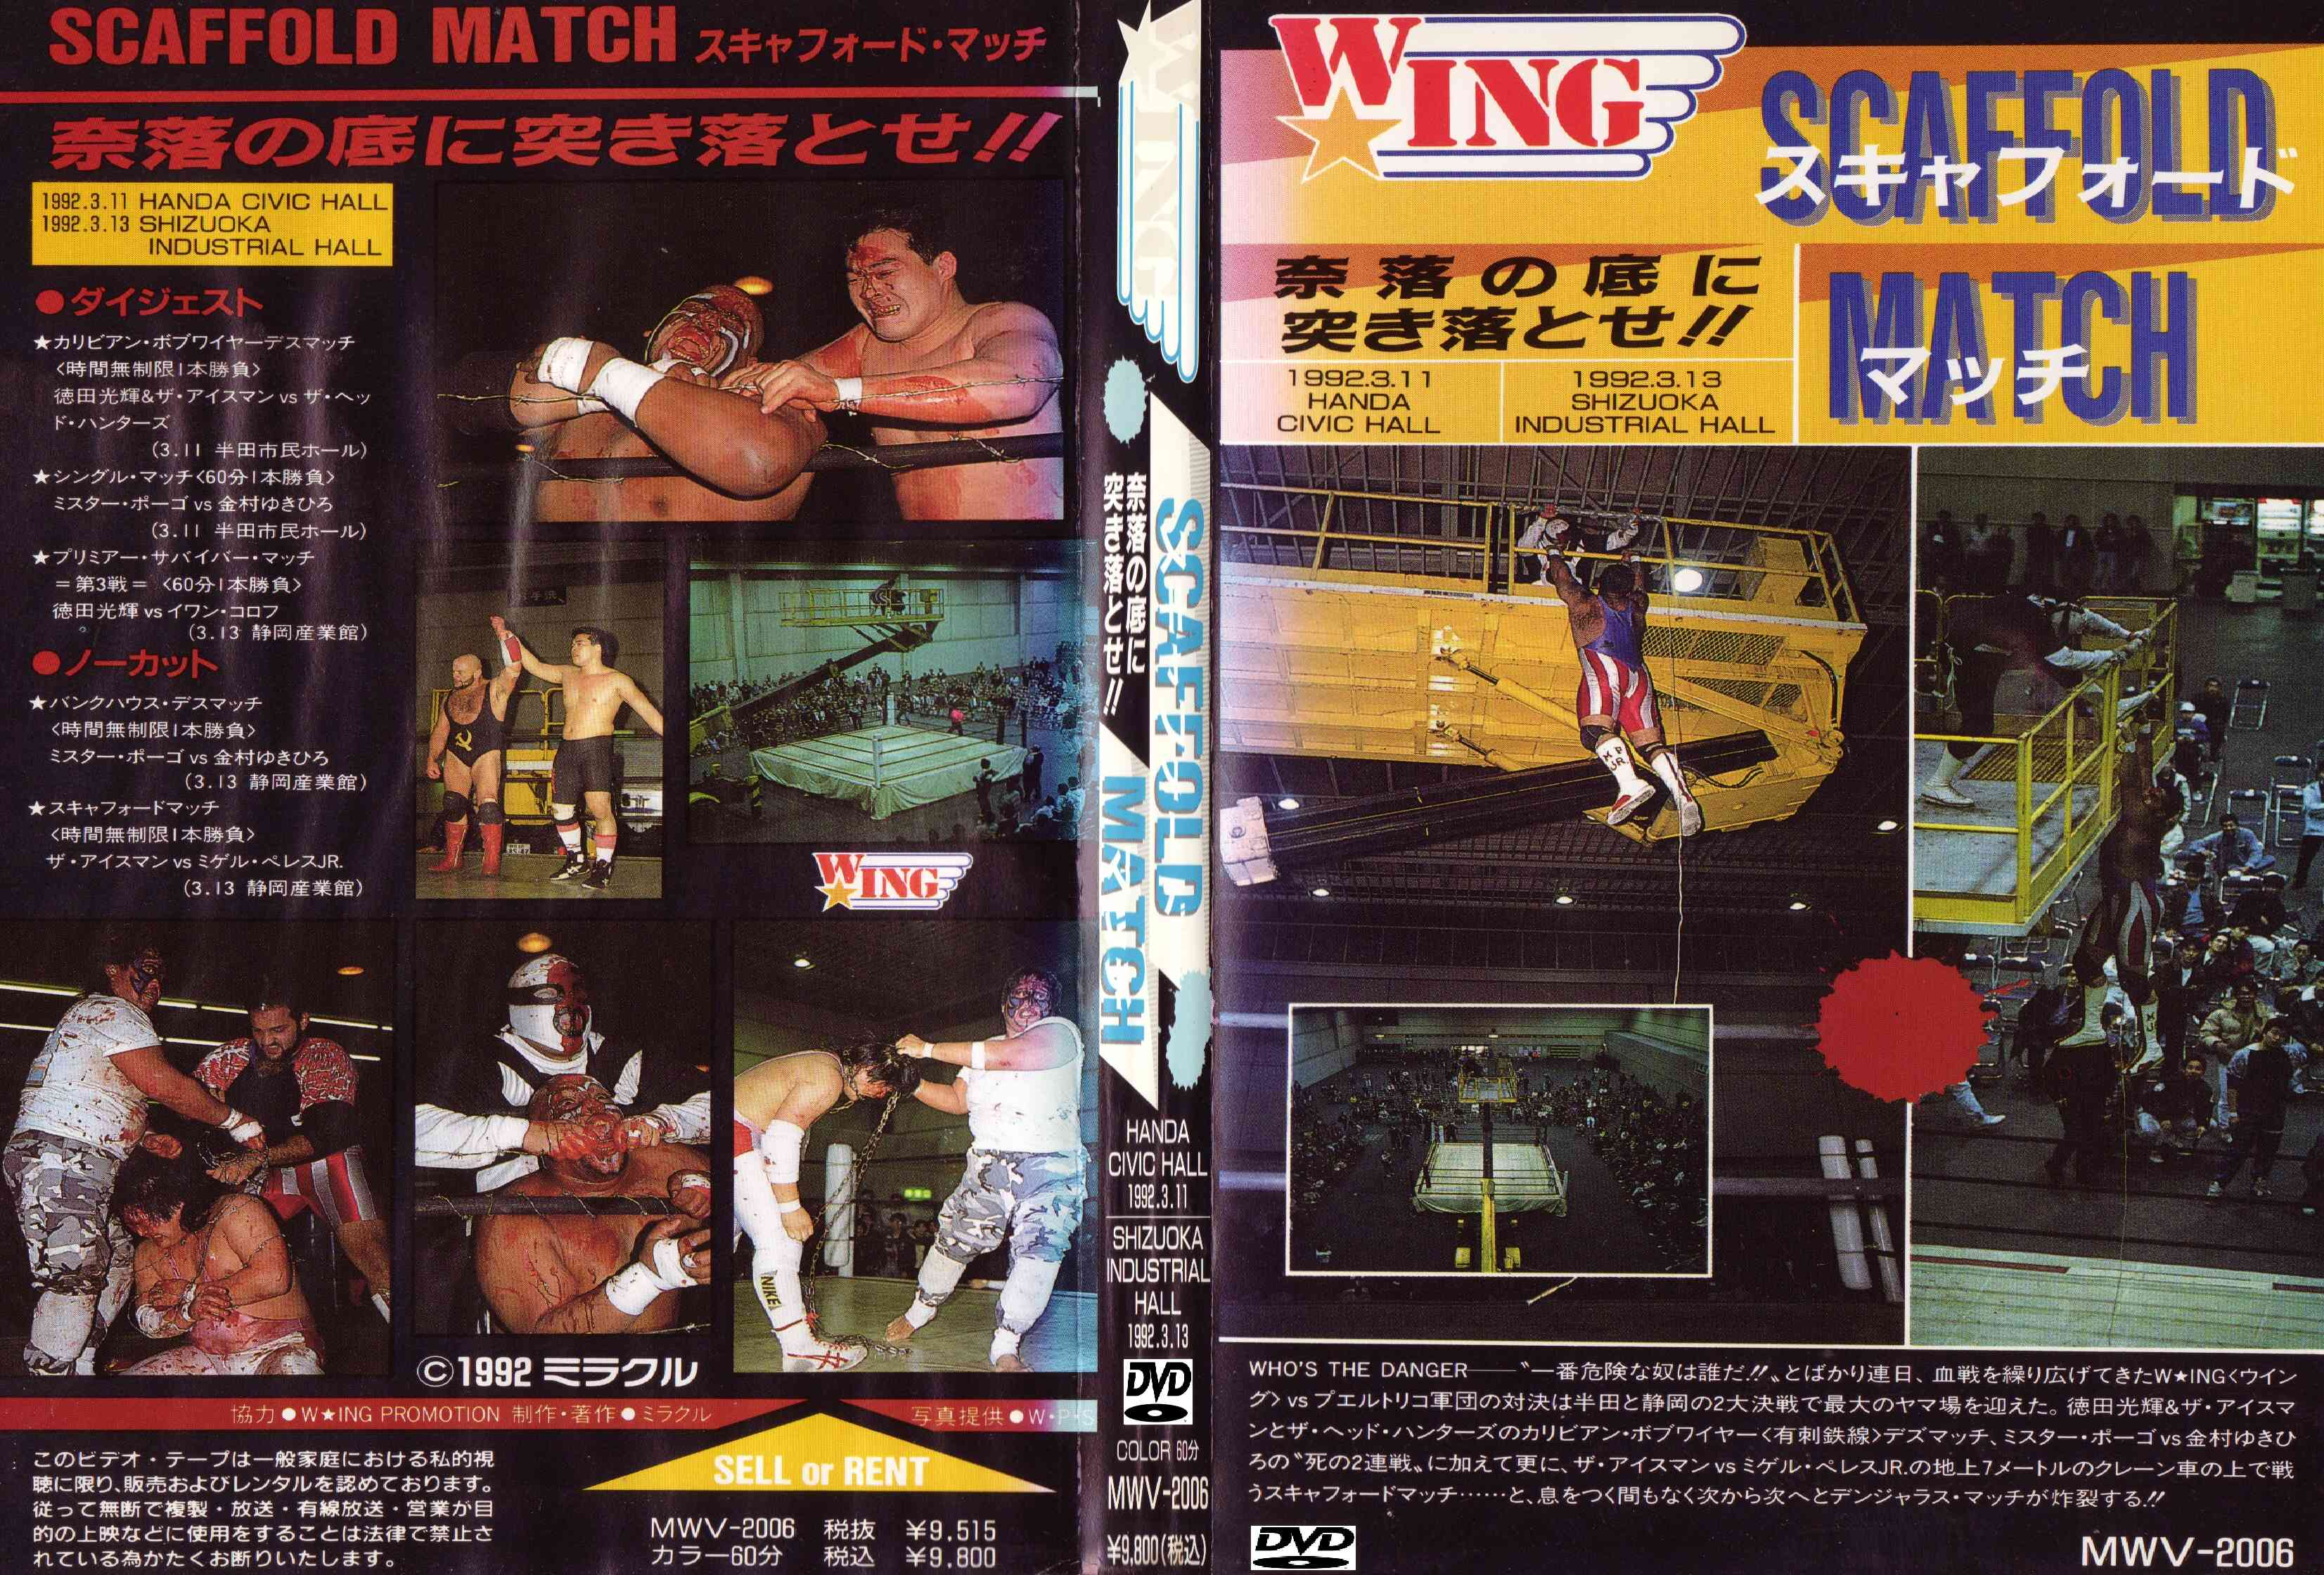 wingscaffoldmatchyy7